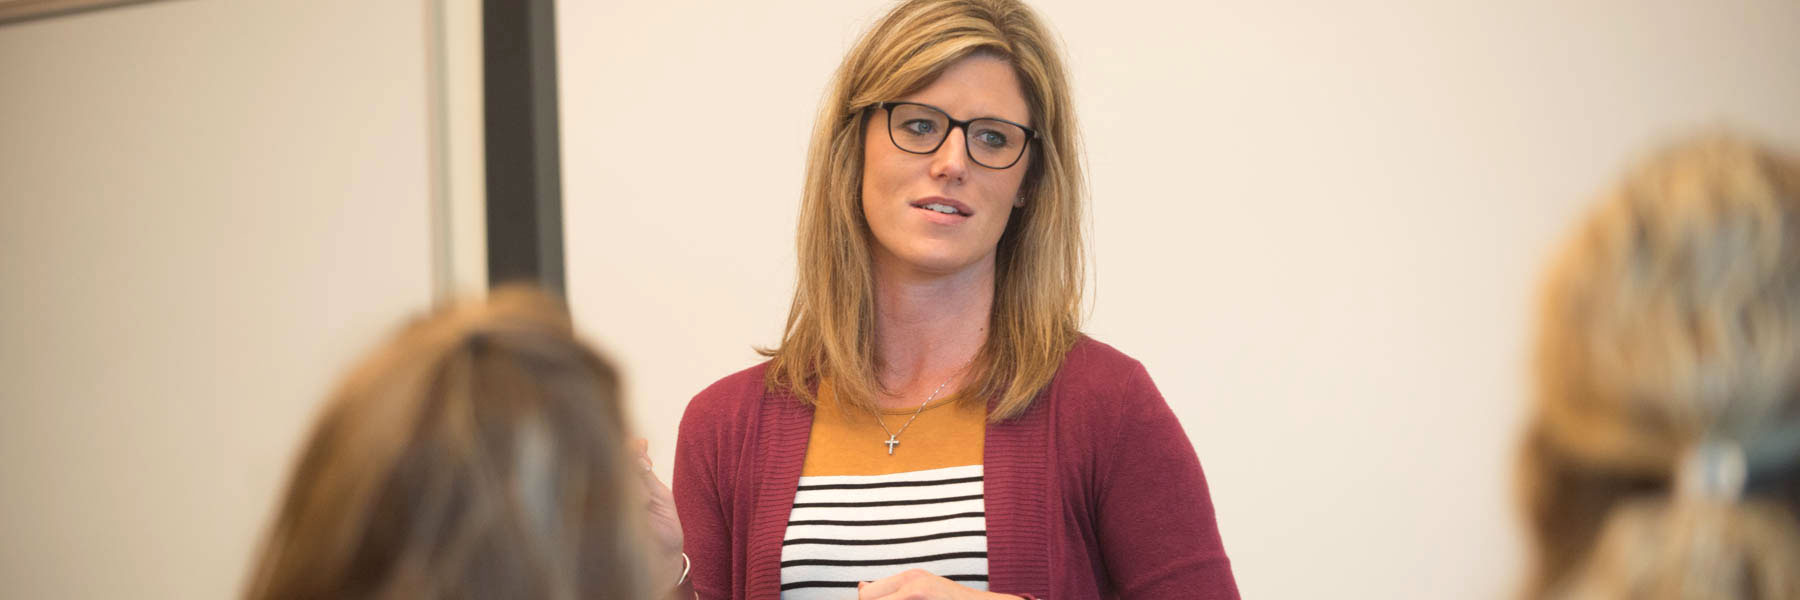 Sarah Harstad, Business Administration department professor